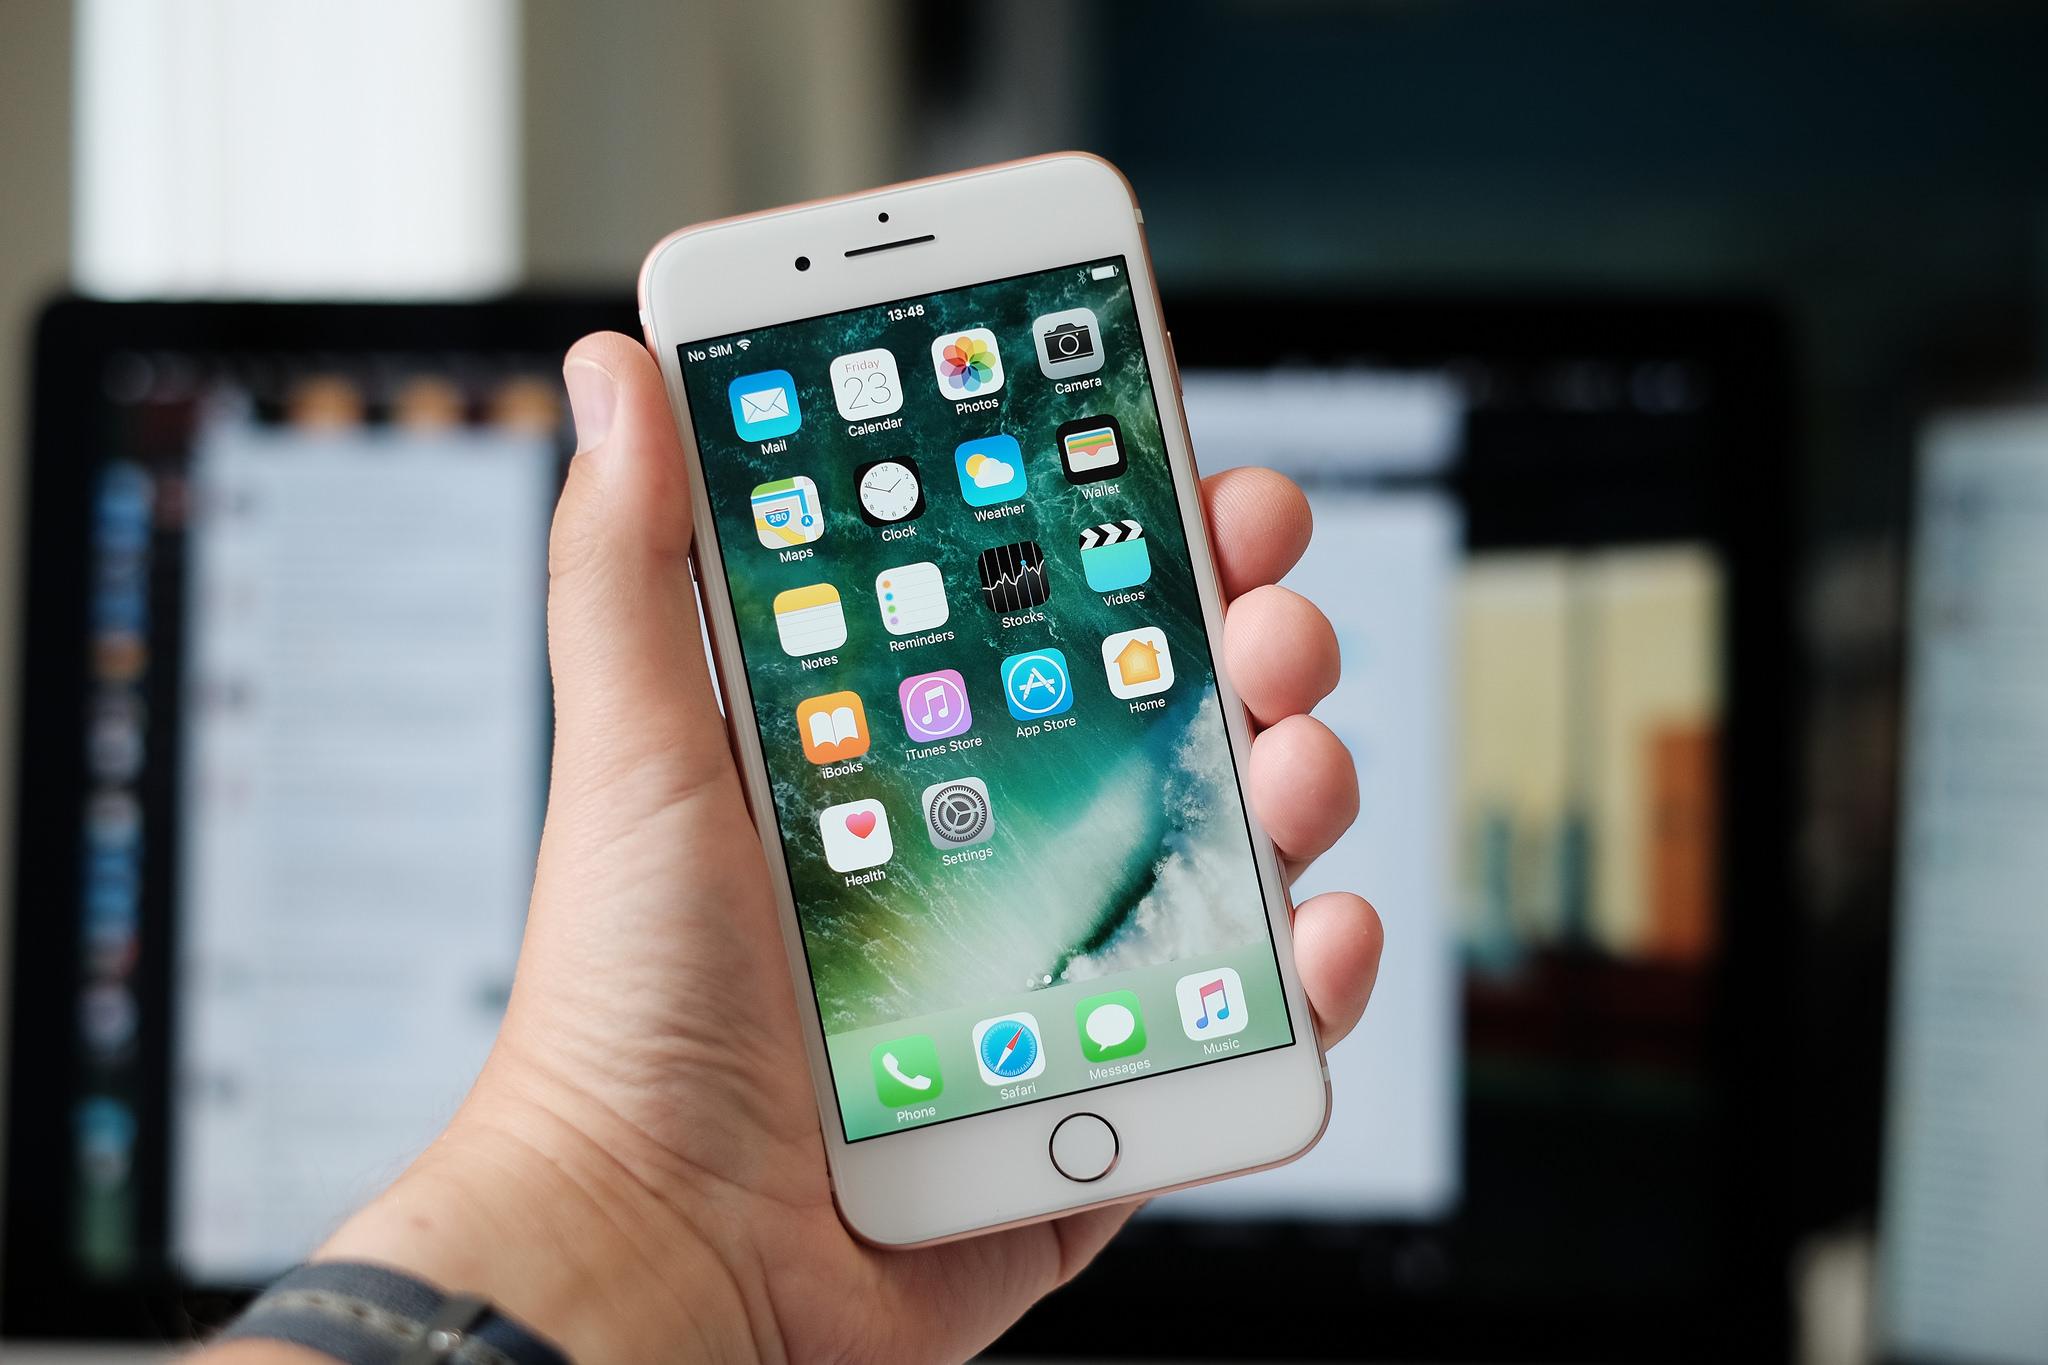 au、新規・のりかえで大幅値下げ。iPhone 8は3.6万円、Xperia 8は2.7万円に